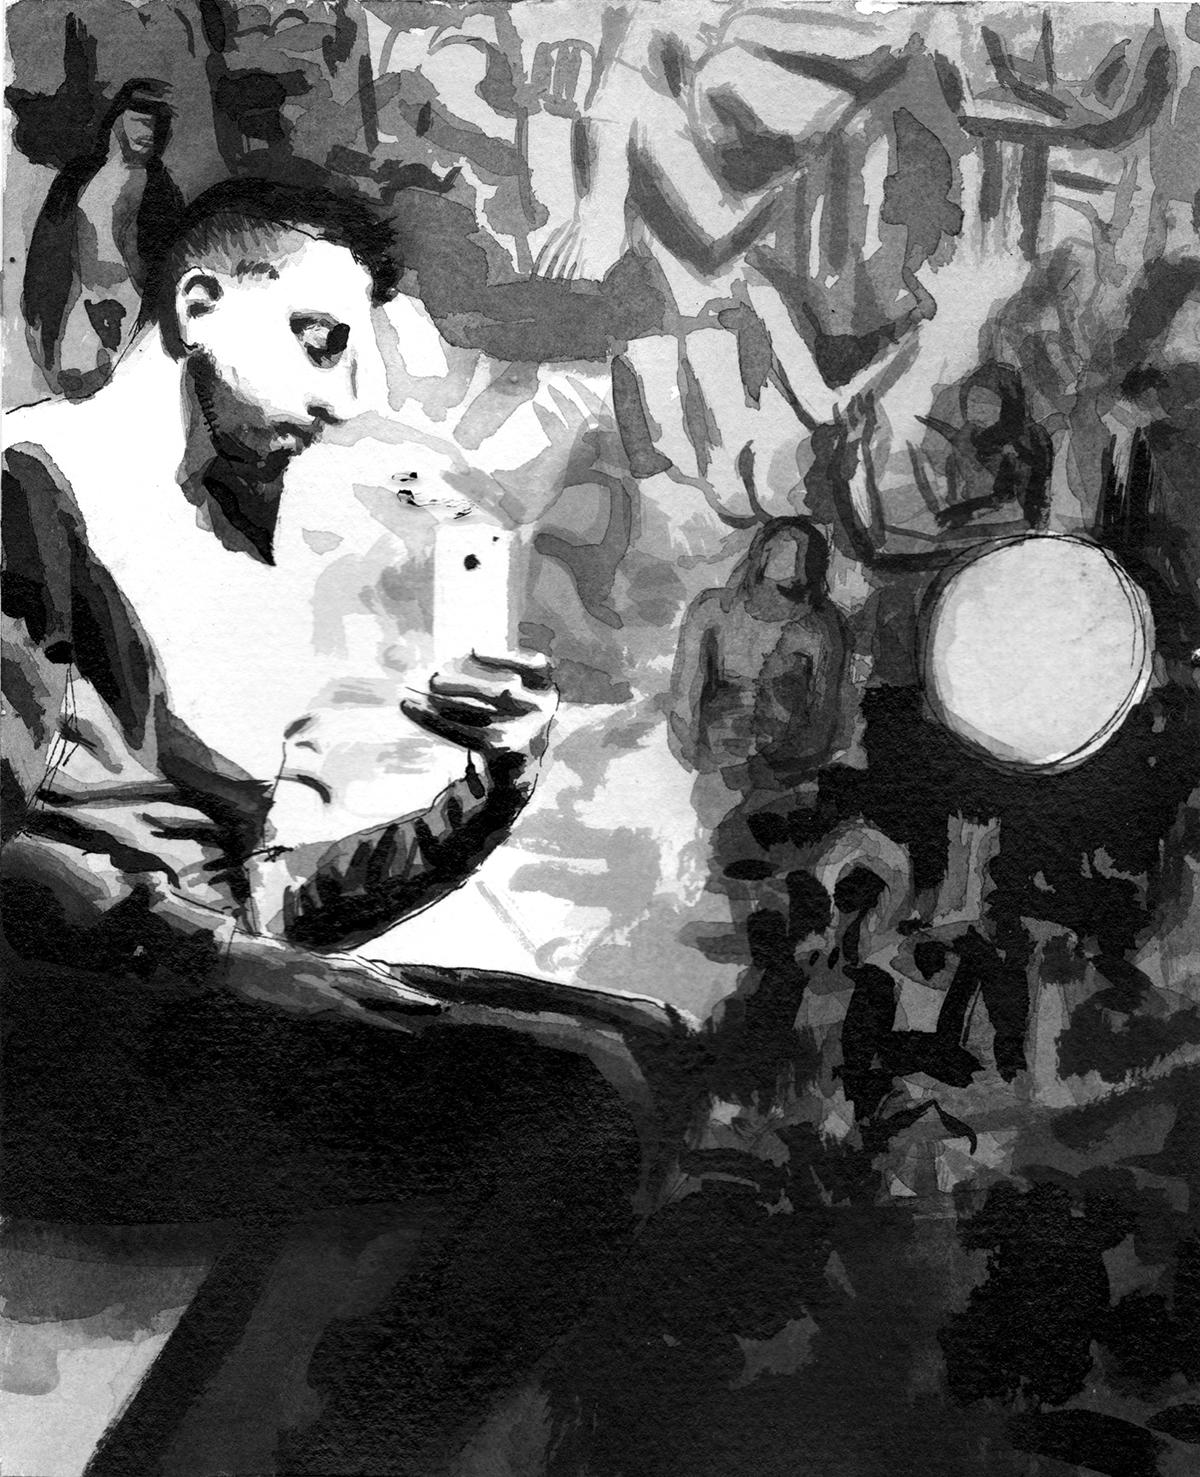 Sholem Krishtalka 'Travelogue Amsterdam', 2013. Courtesy the artist